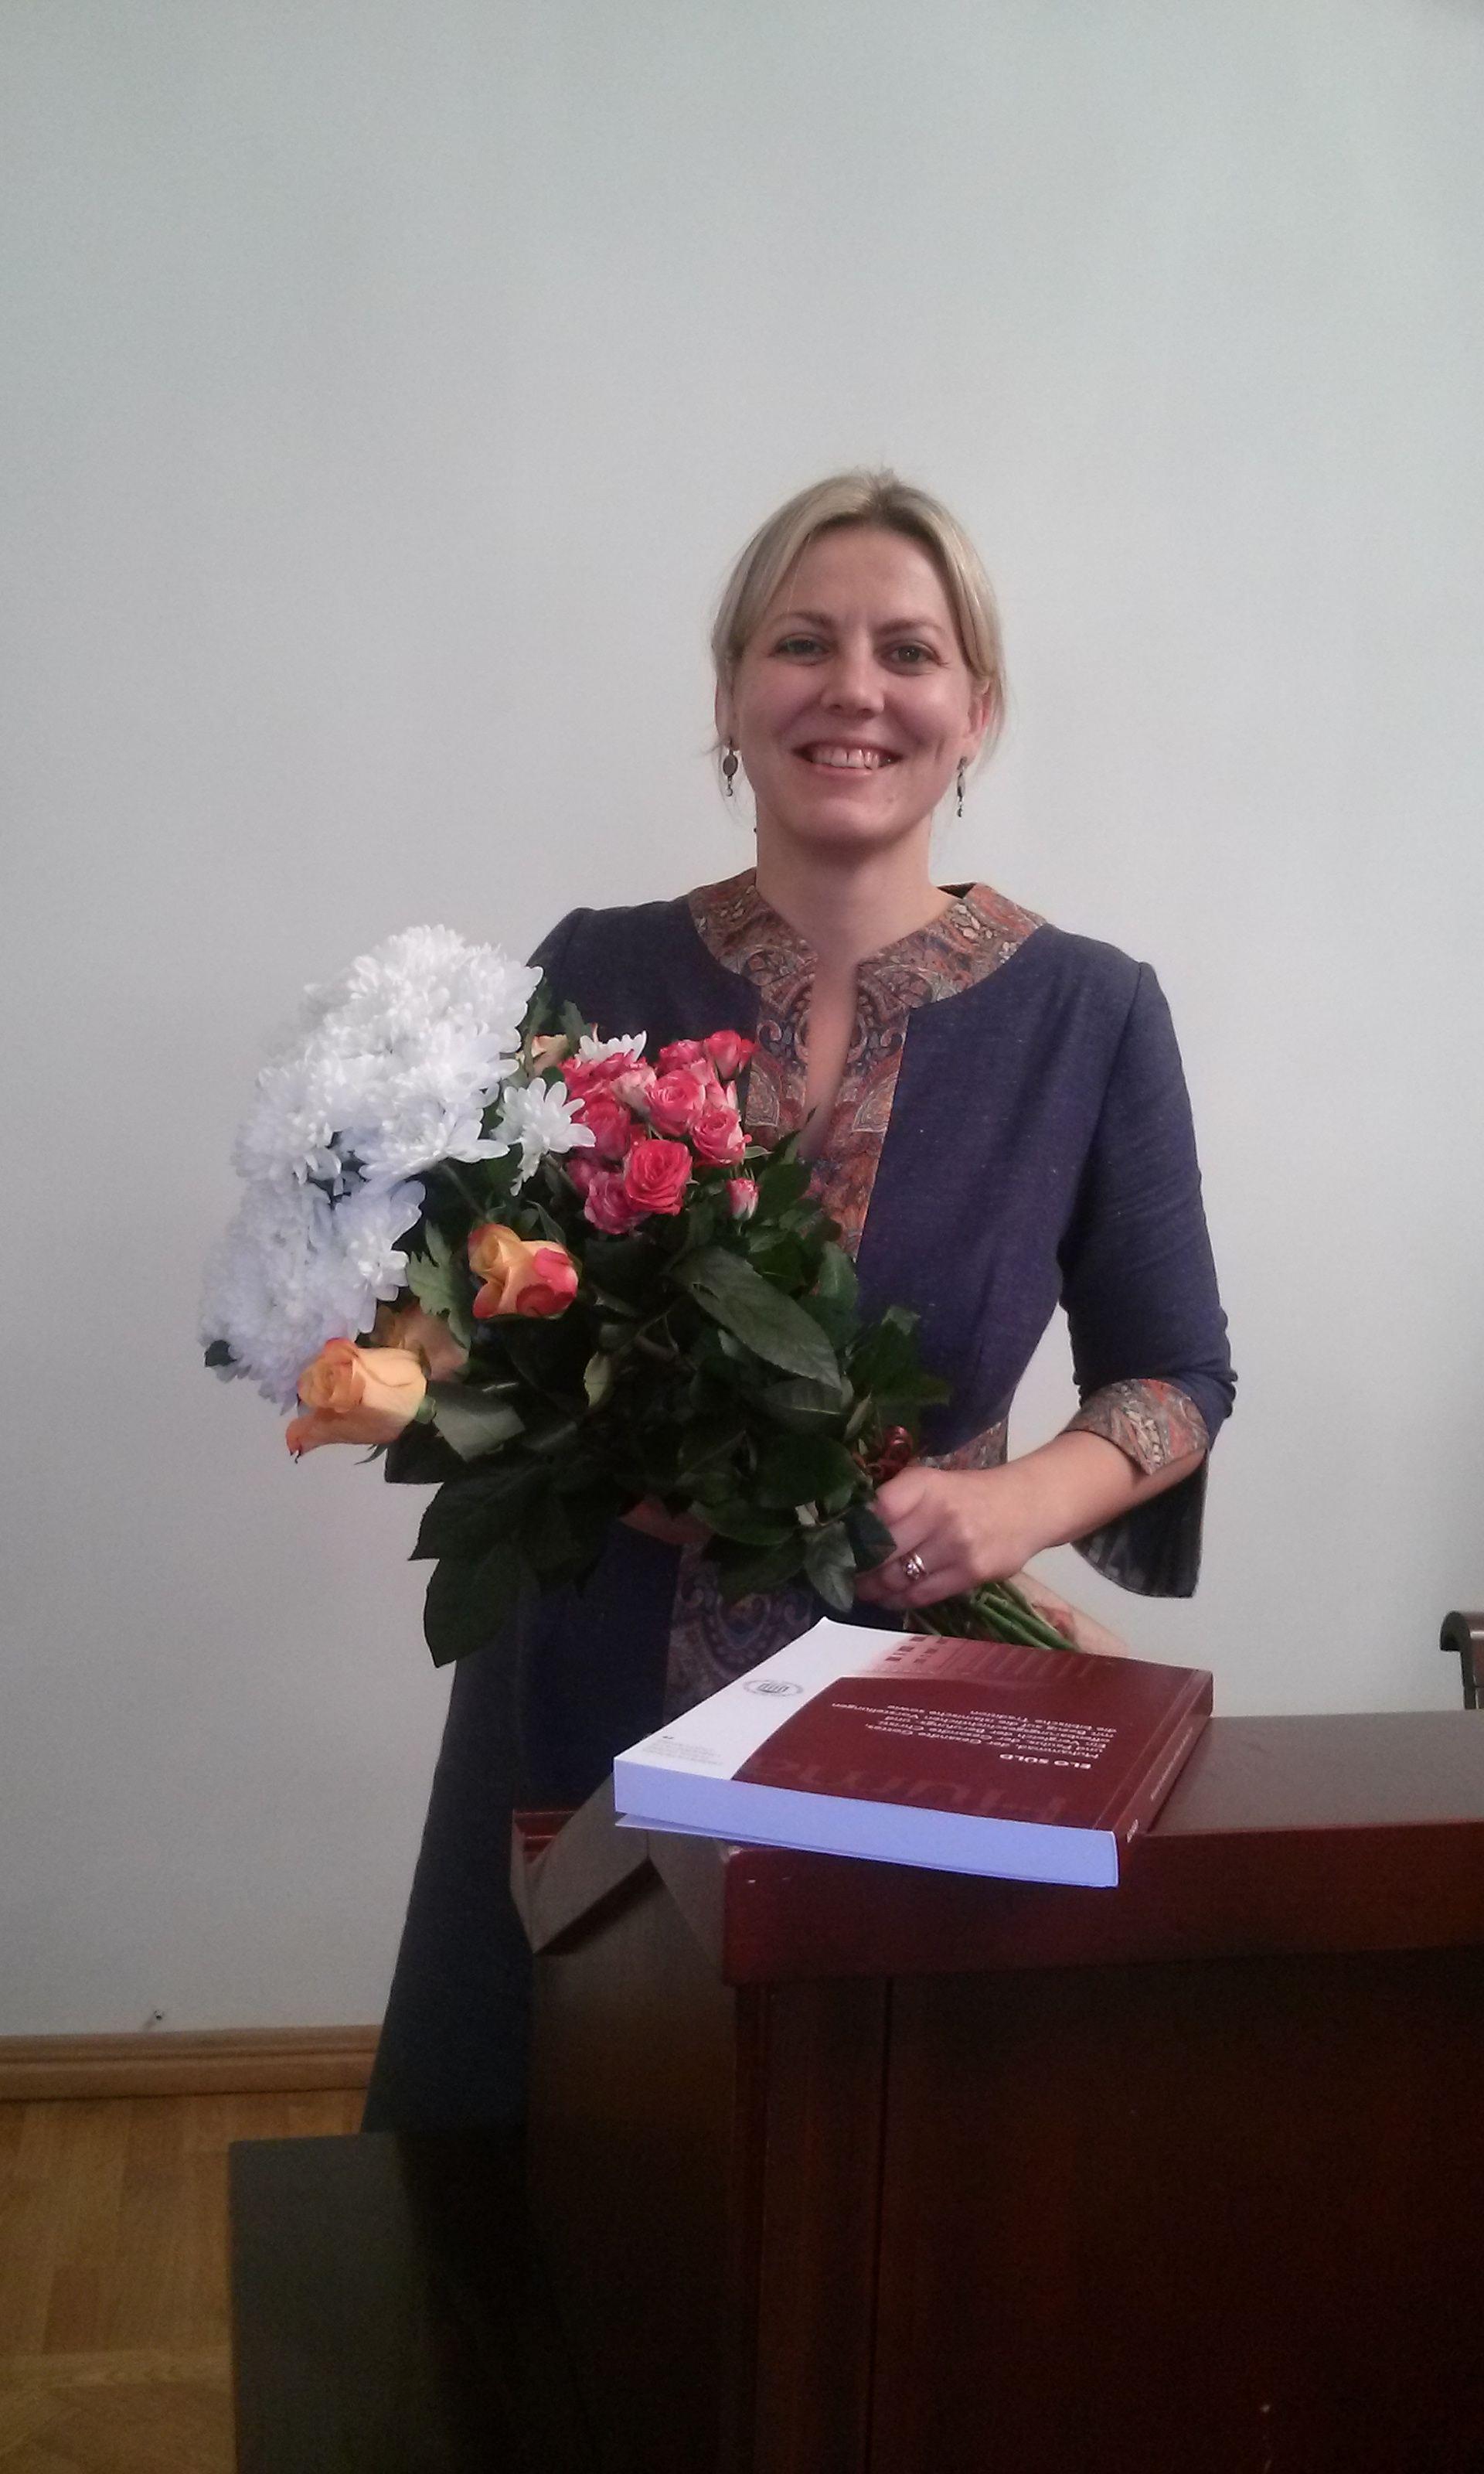 Värske doktor Elo Süld, foto: Urmas Nõmmik